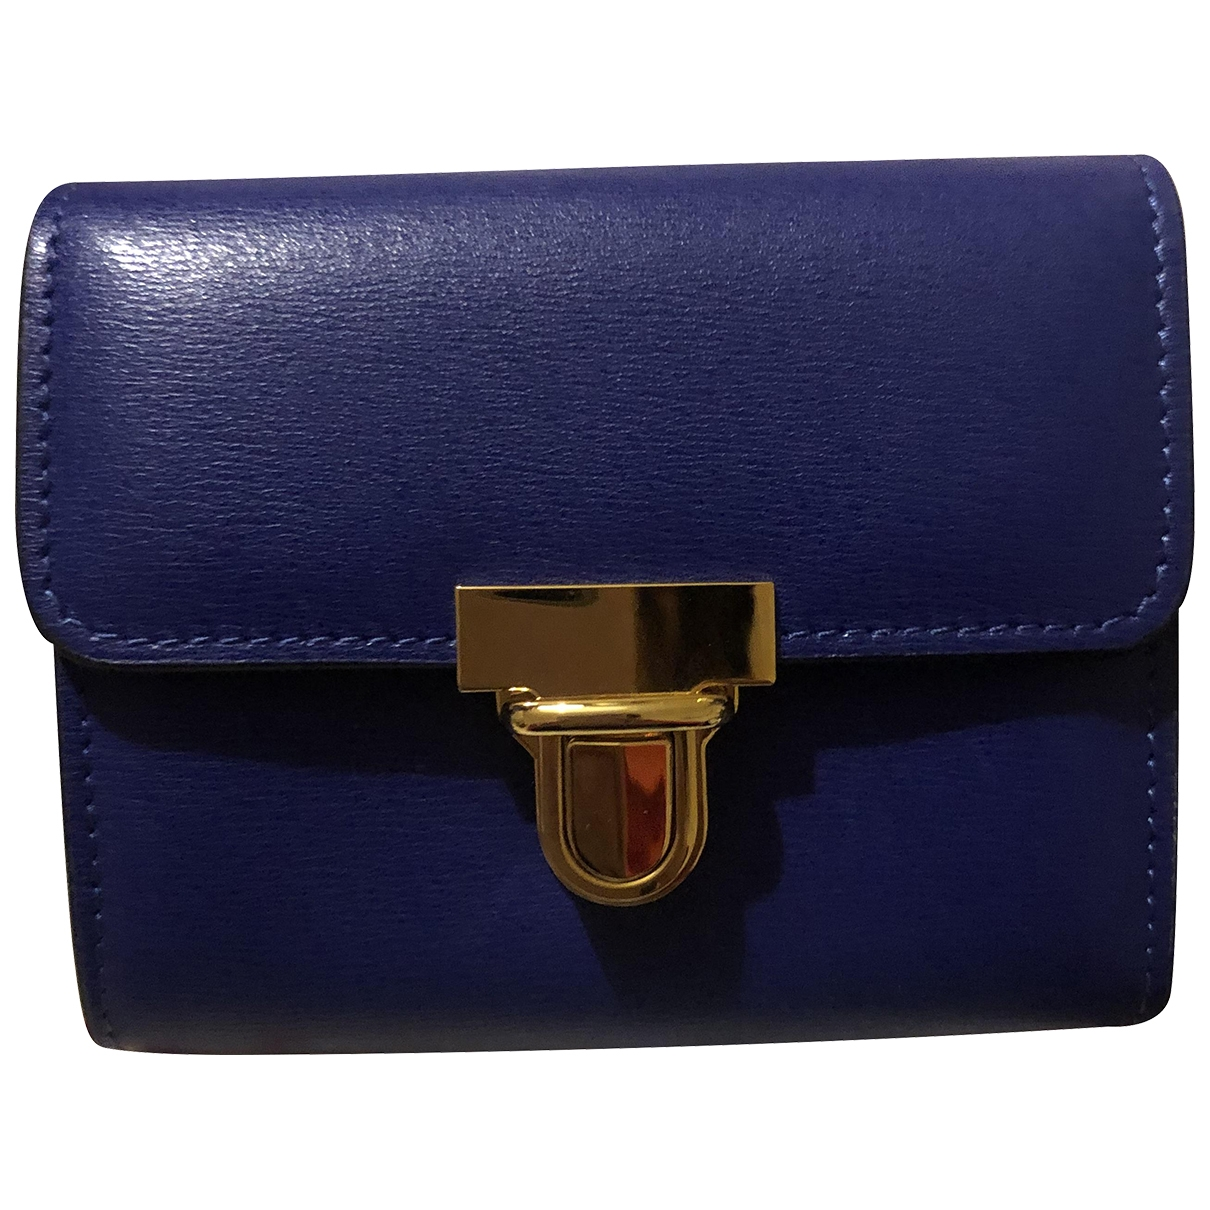 Marni \N Portemonnaie in  Blau Leder